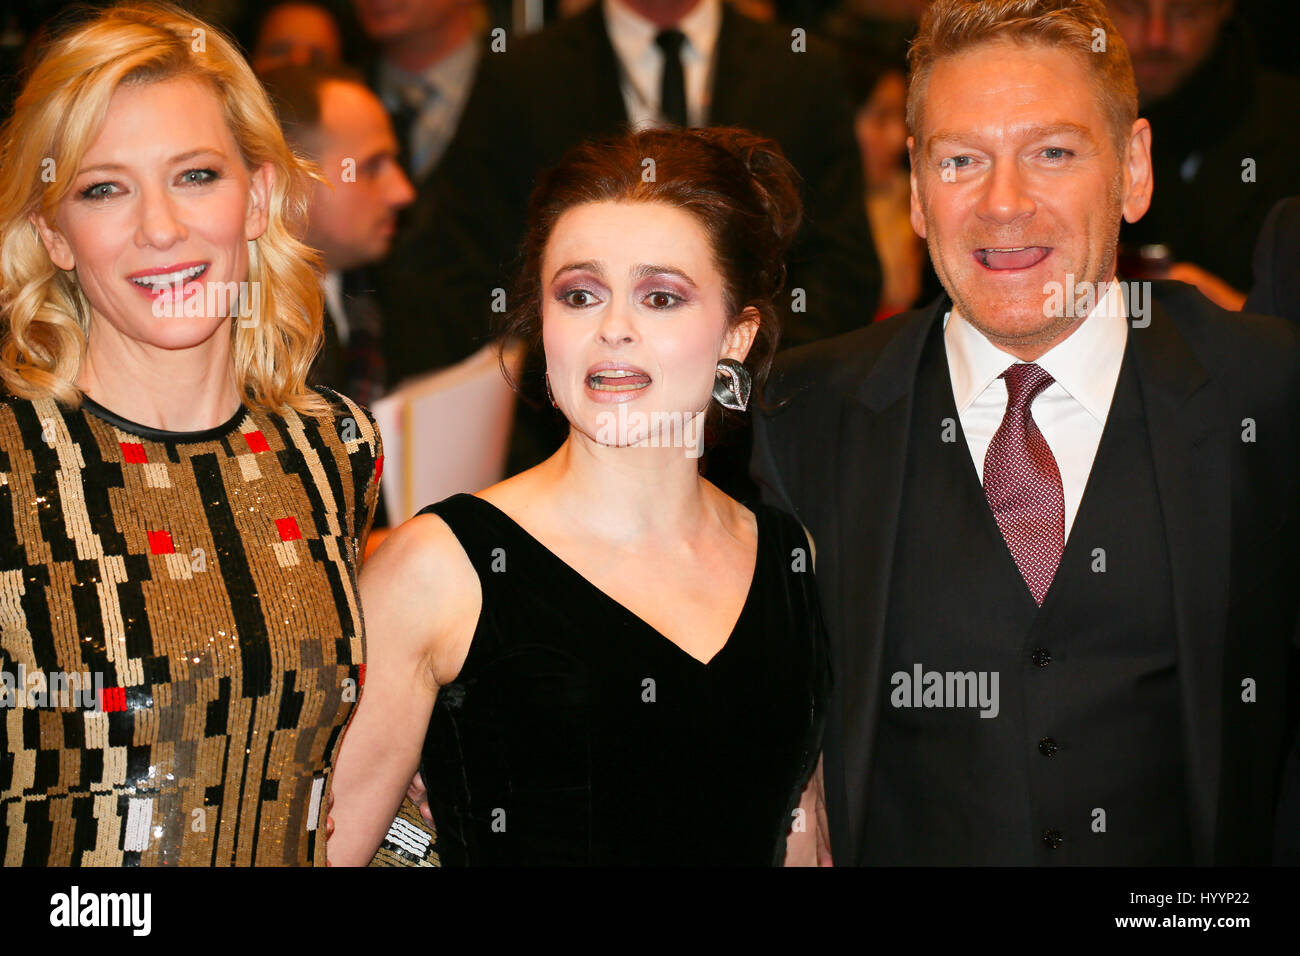 Berlin, Germany, February 13th, 2015: Cate Blanchett, Helena Bonham Carter, Kenneth Branagh at premiere of Cinderella - Stock Image